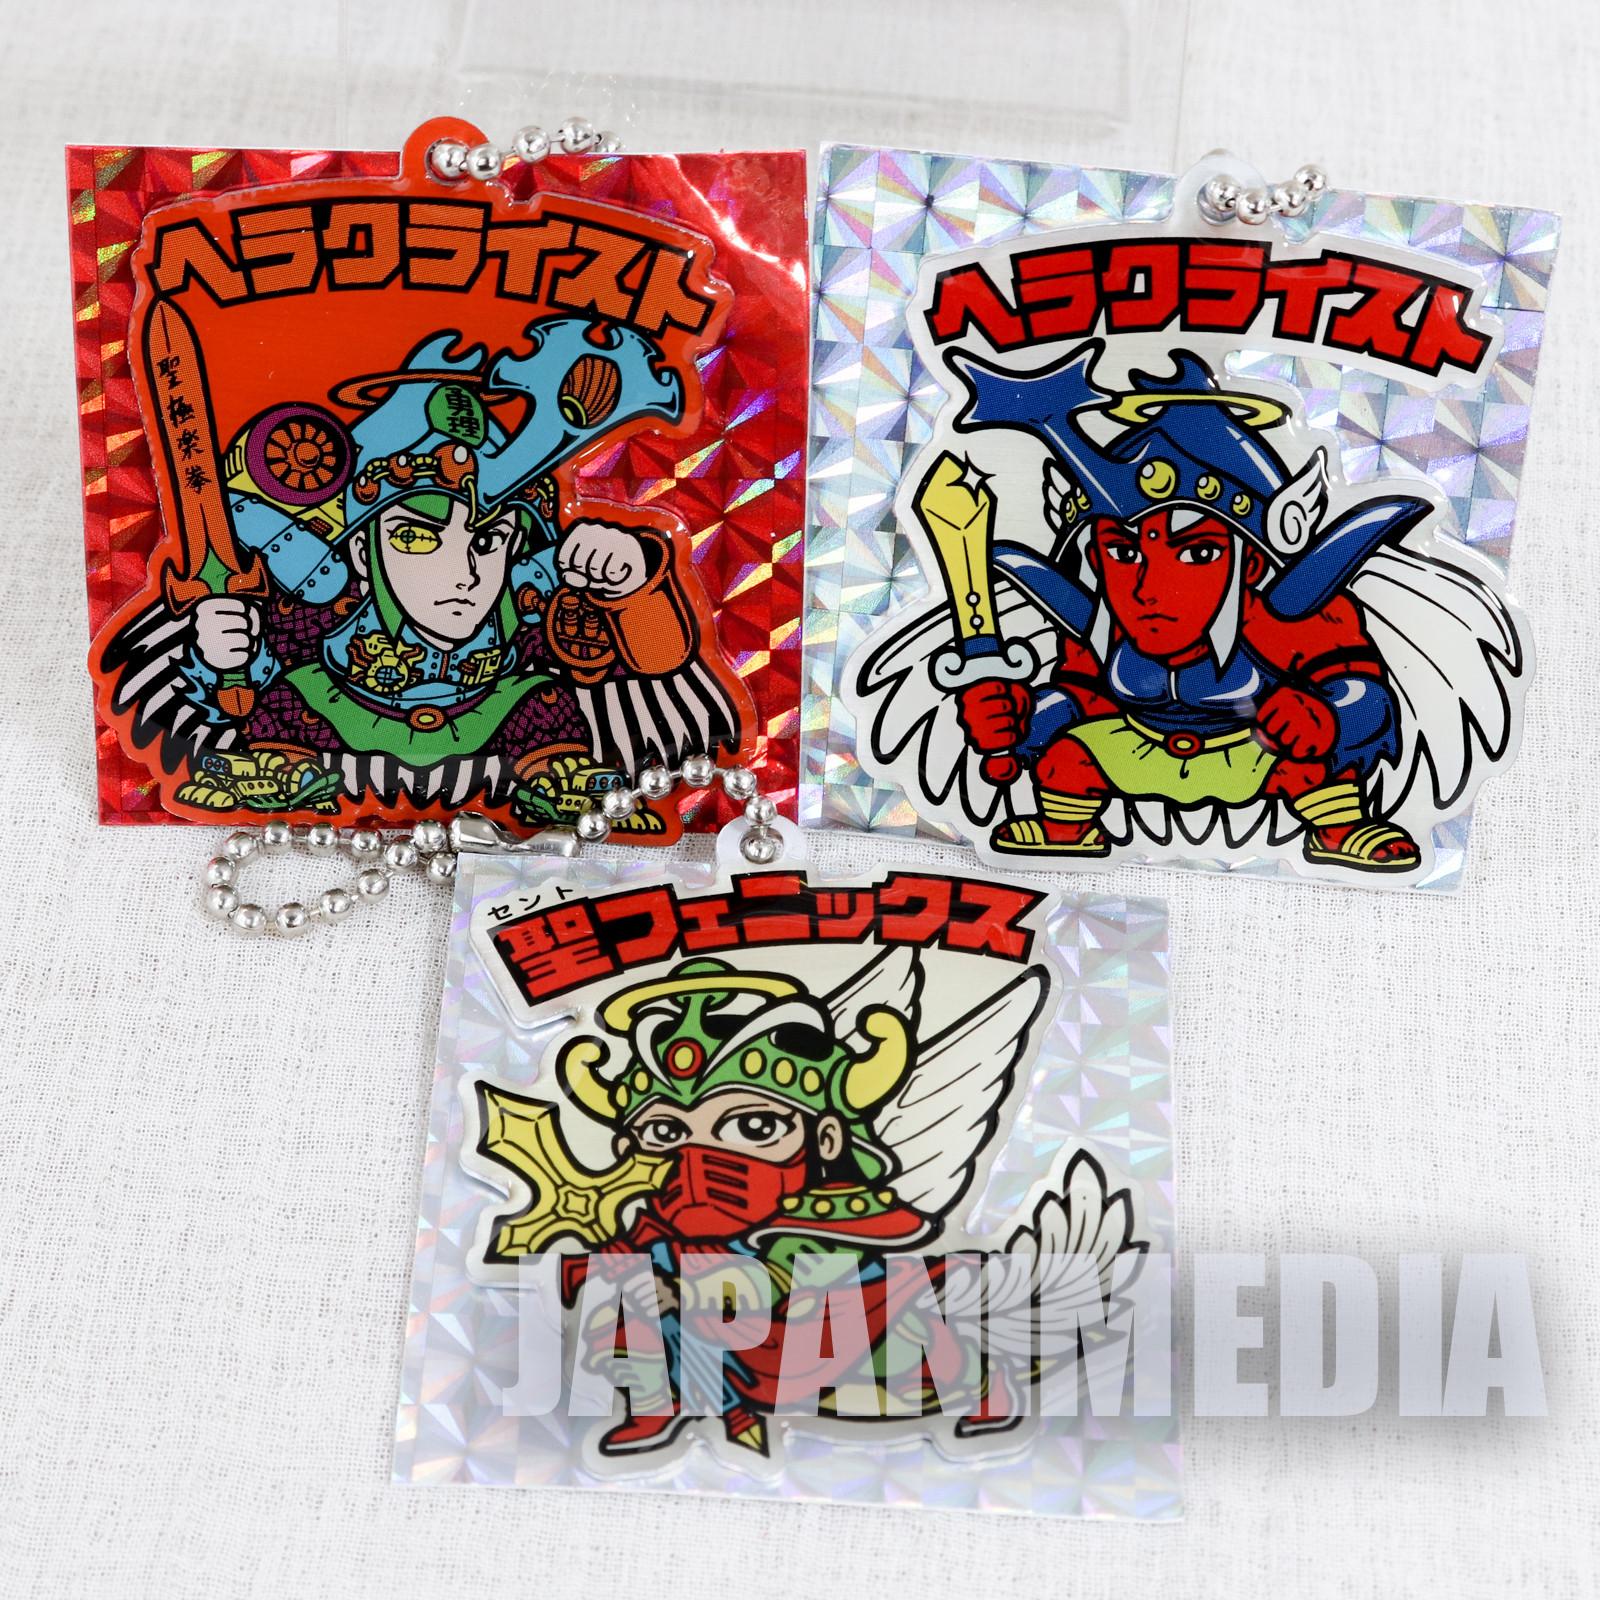 Bikkuriman Mascot Ballchain 3pc Set Herakuraisuto Saint Phoenix JAPAN ANIME